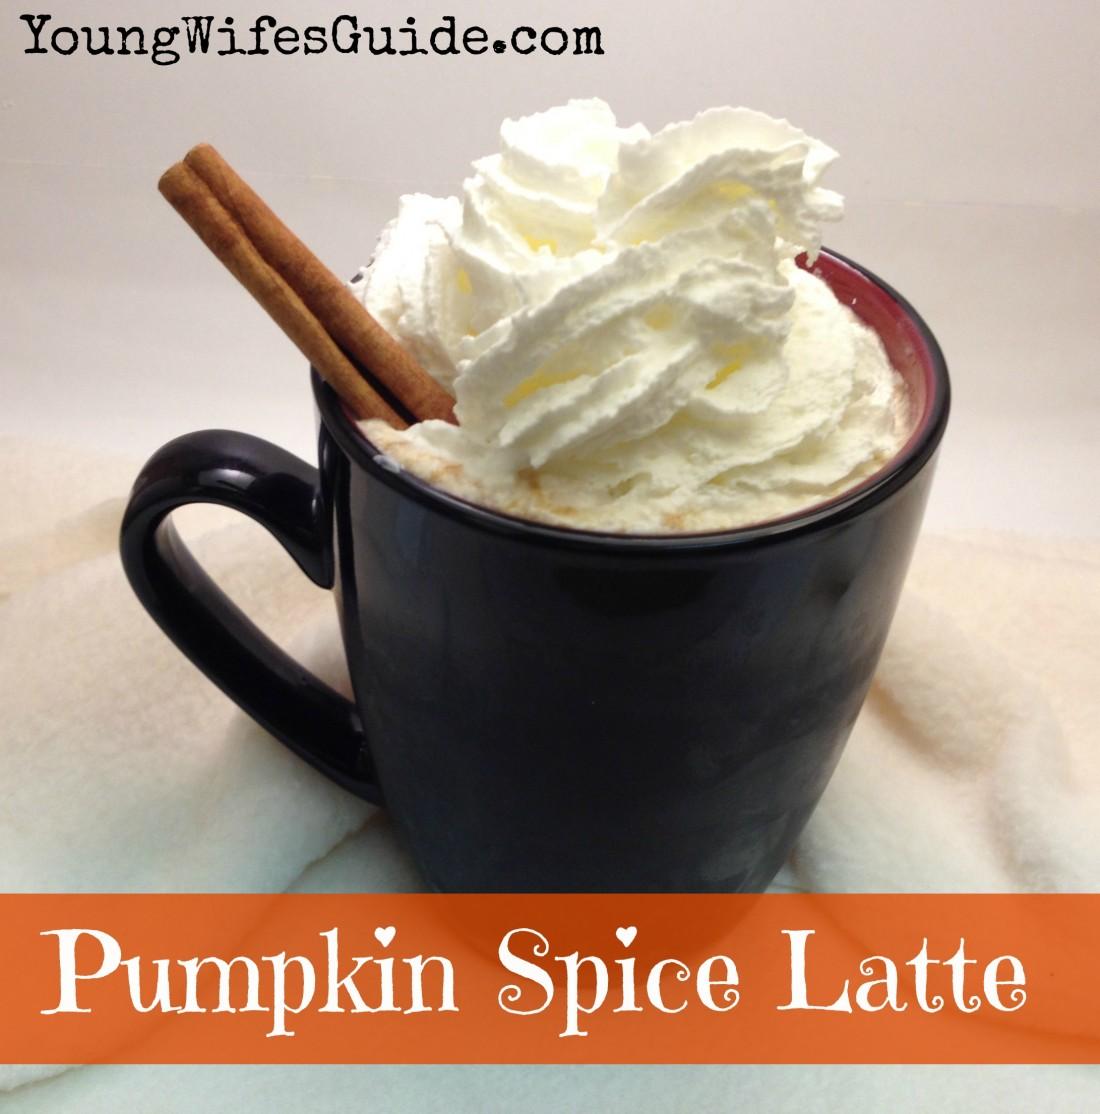 How To Make A Pumpkin Spice Latte Recipes — Dishmaps